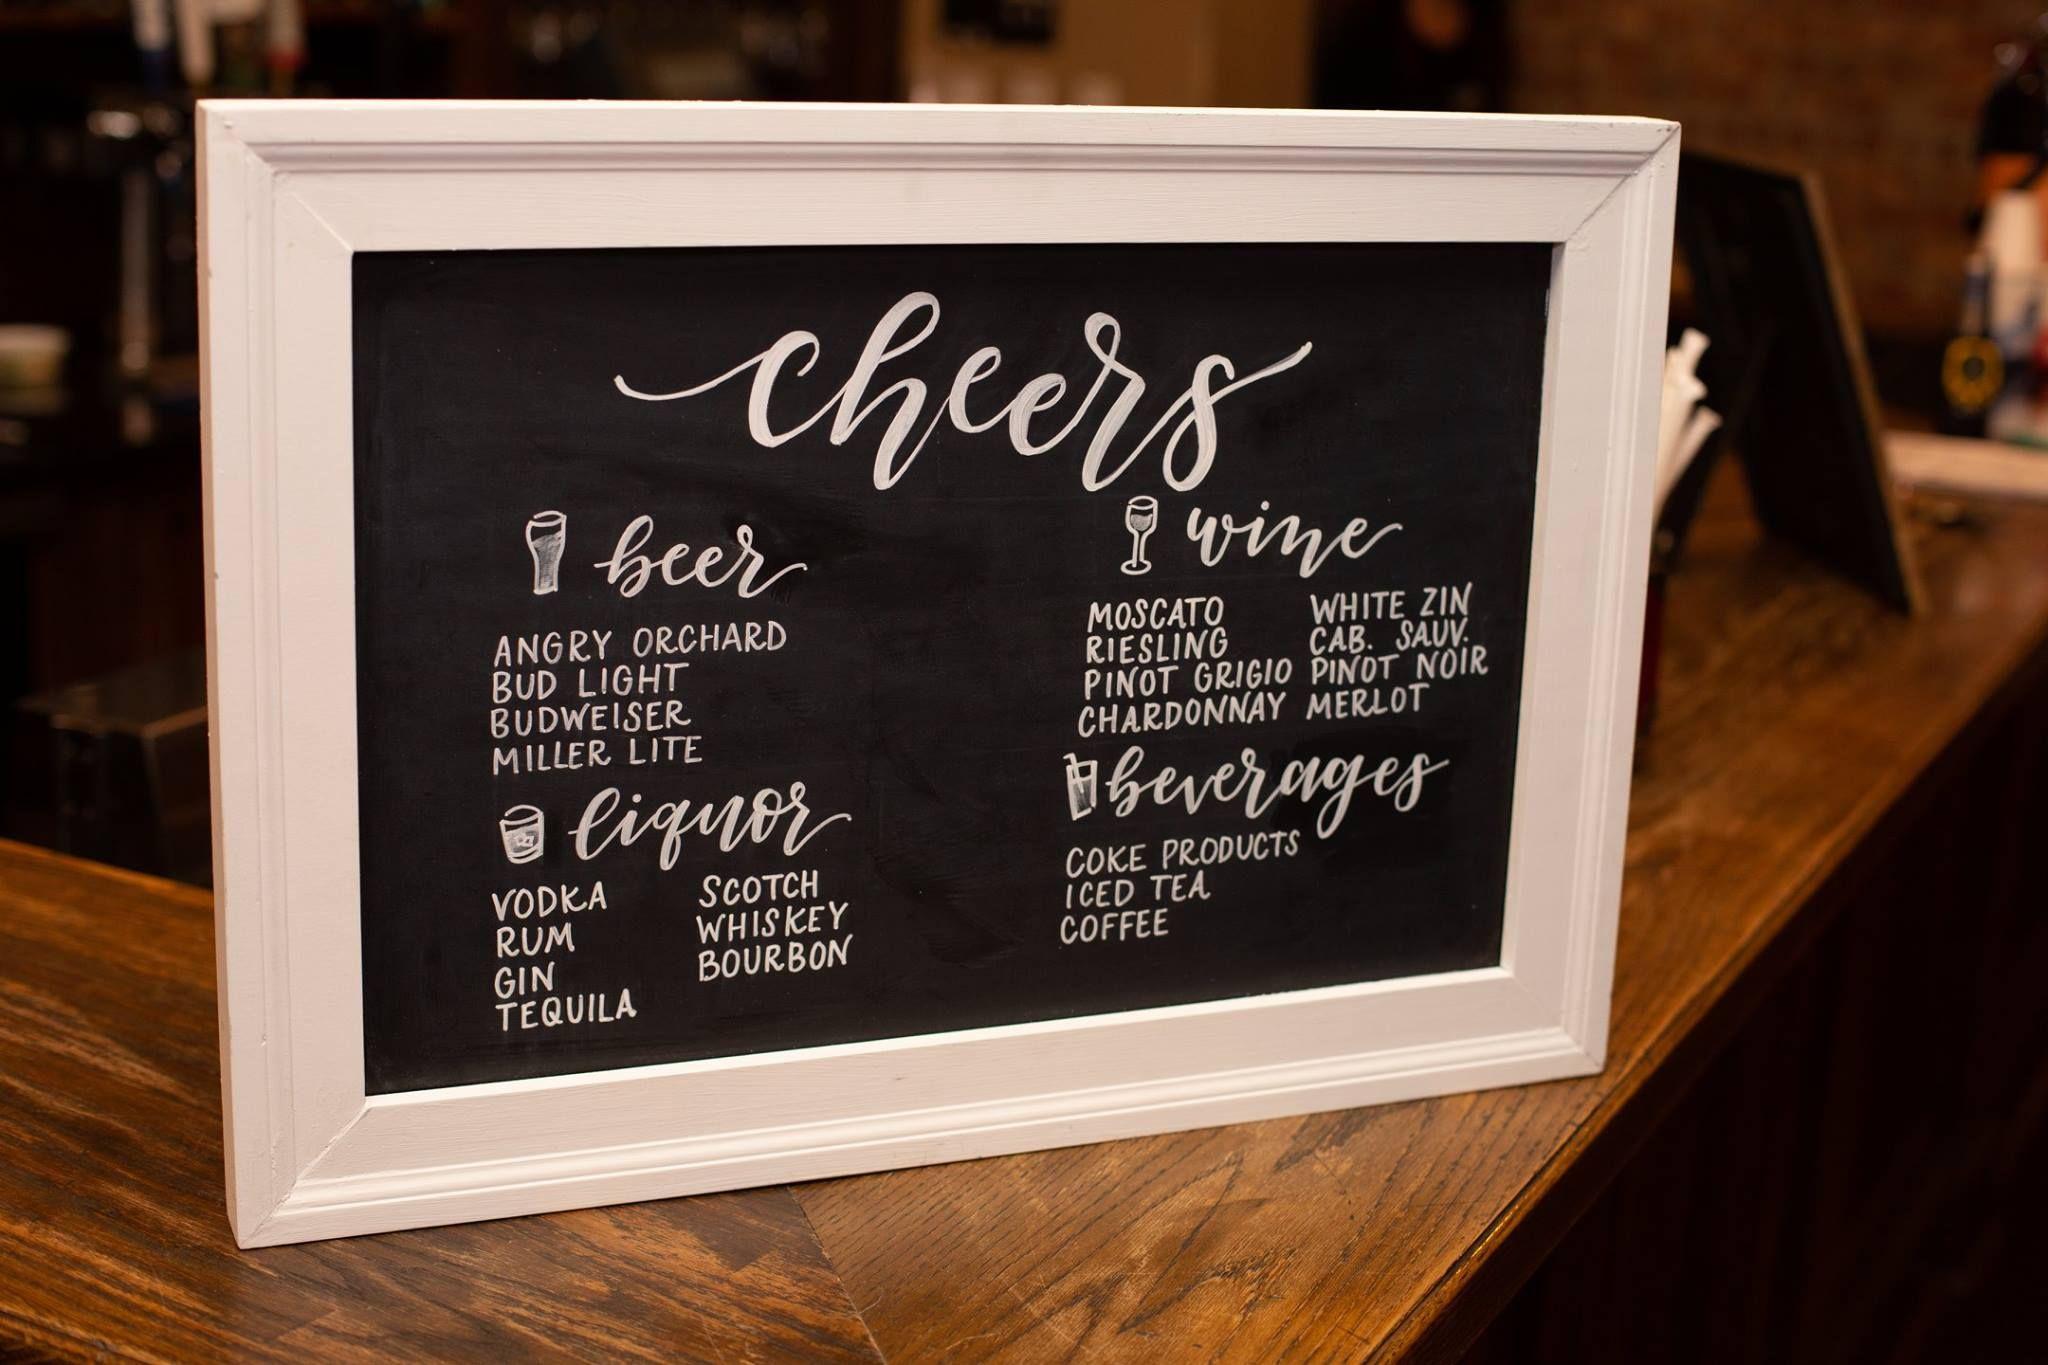 Cheers Bar Menu Modern Calligraphy Chalkboard lettering